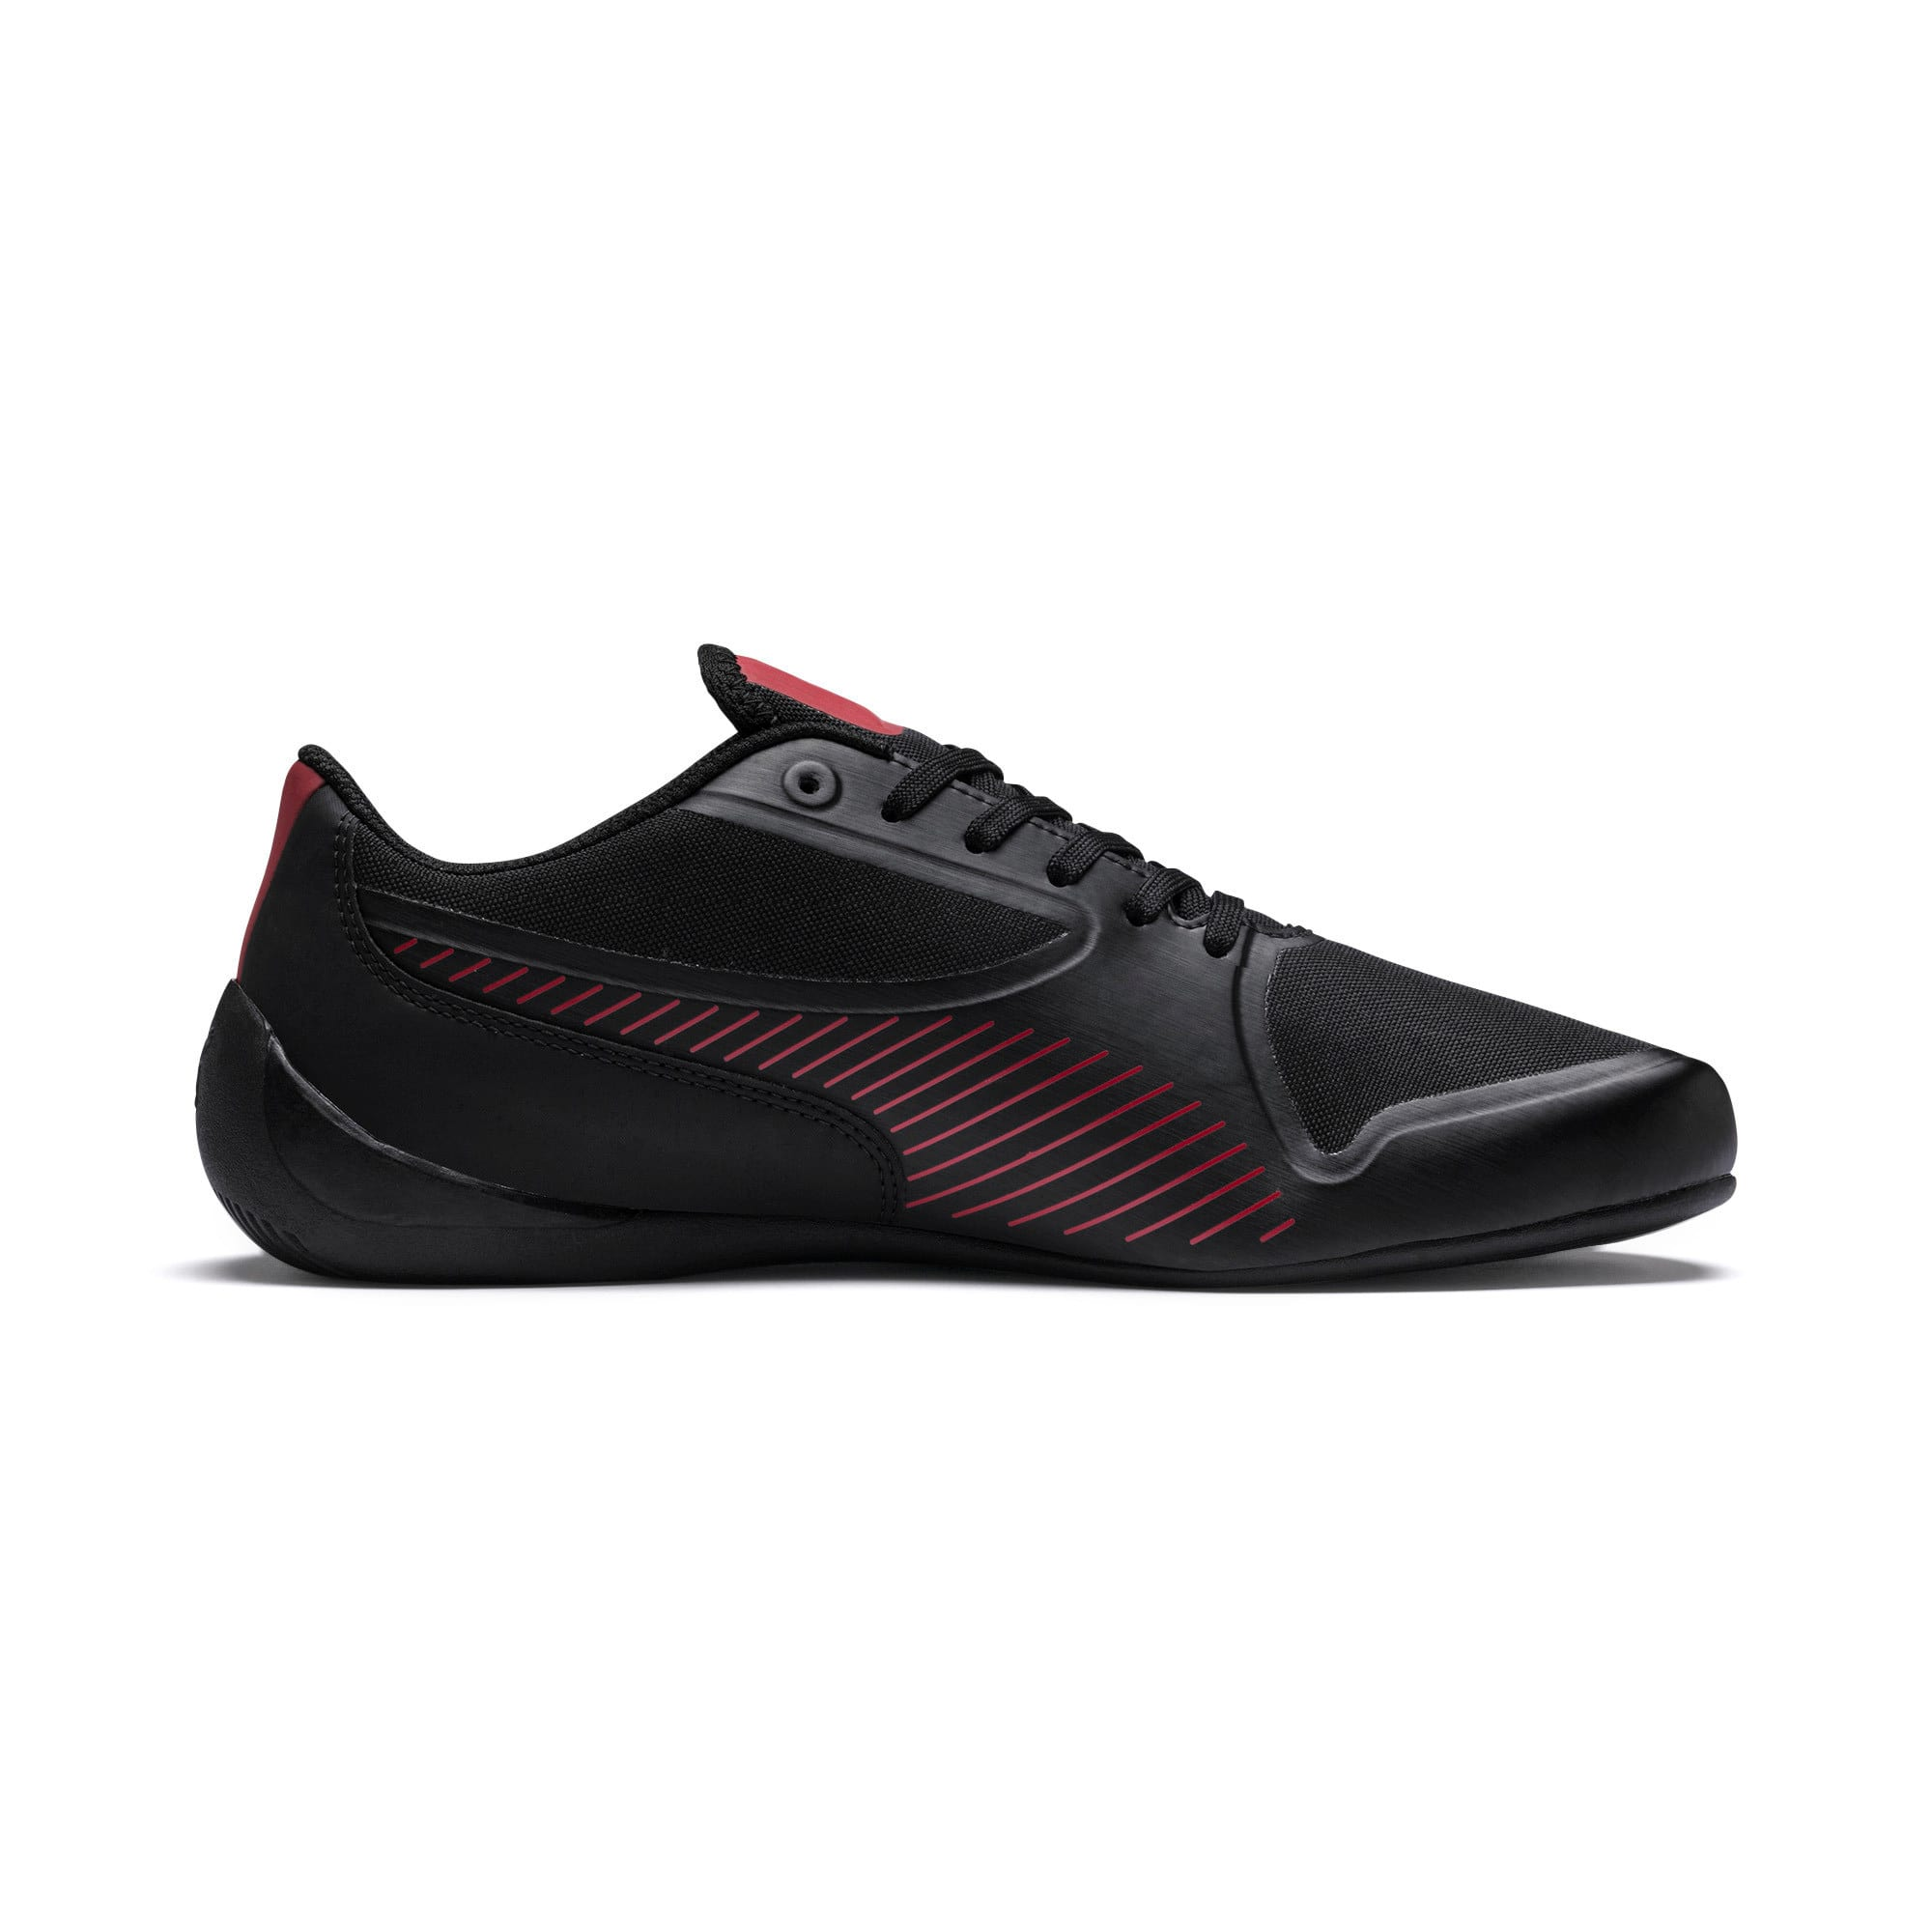 Thumbnail 5 of Scuderia Ferrari Drift Cat 7 Ultra Shoes, Puma Black-Rosso Corsa, medium